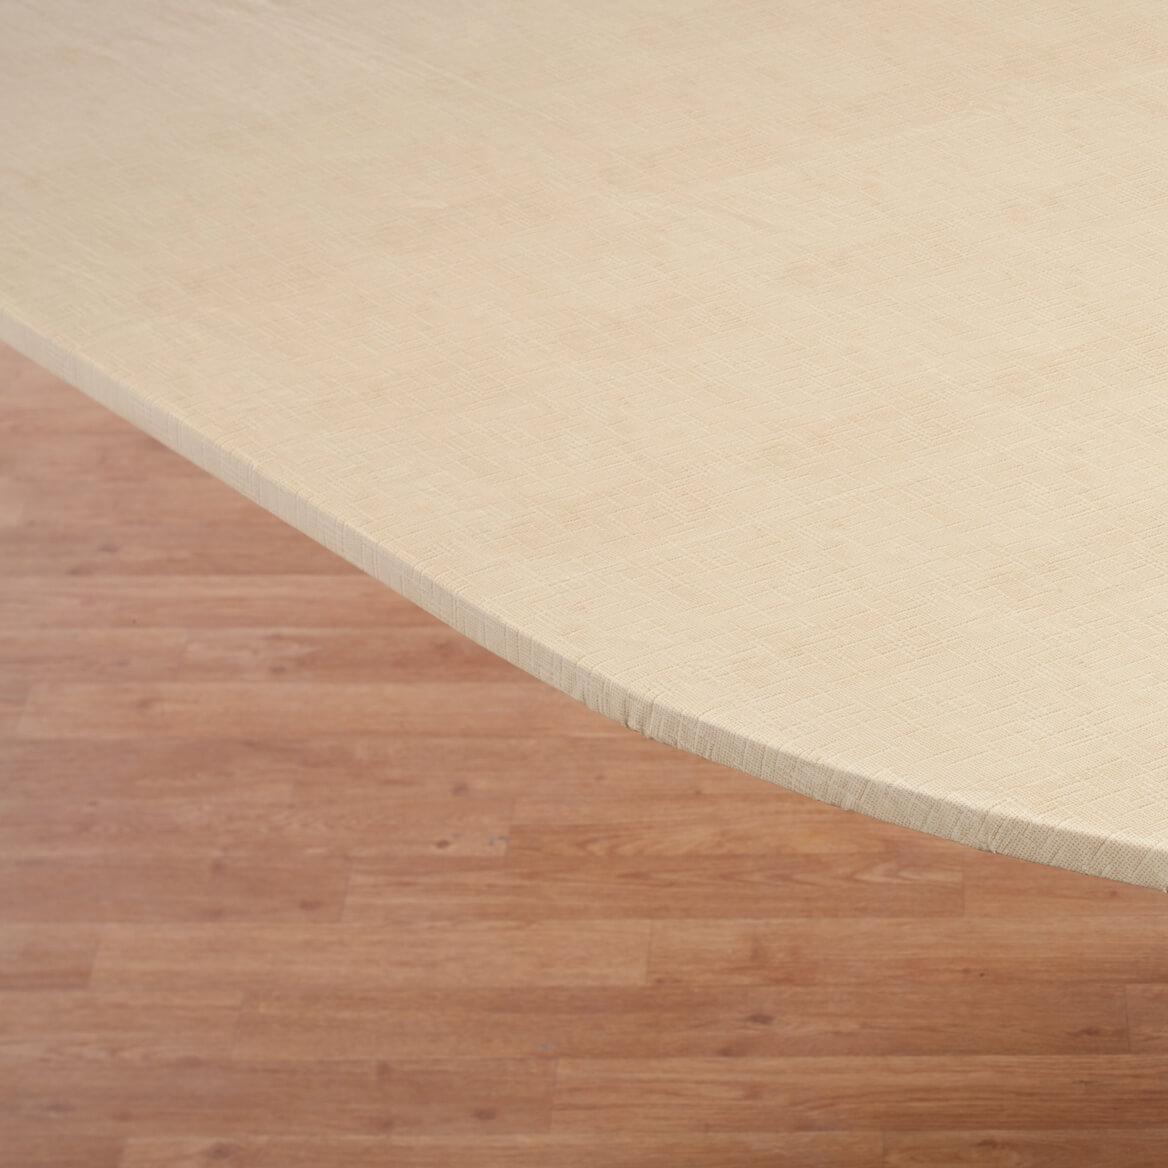 Illusion Weave Vinyl Elasticized Table Cover-356713